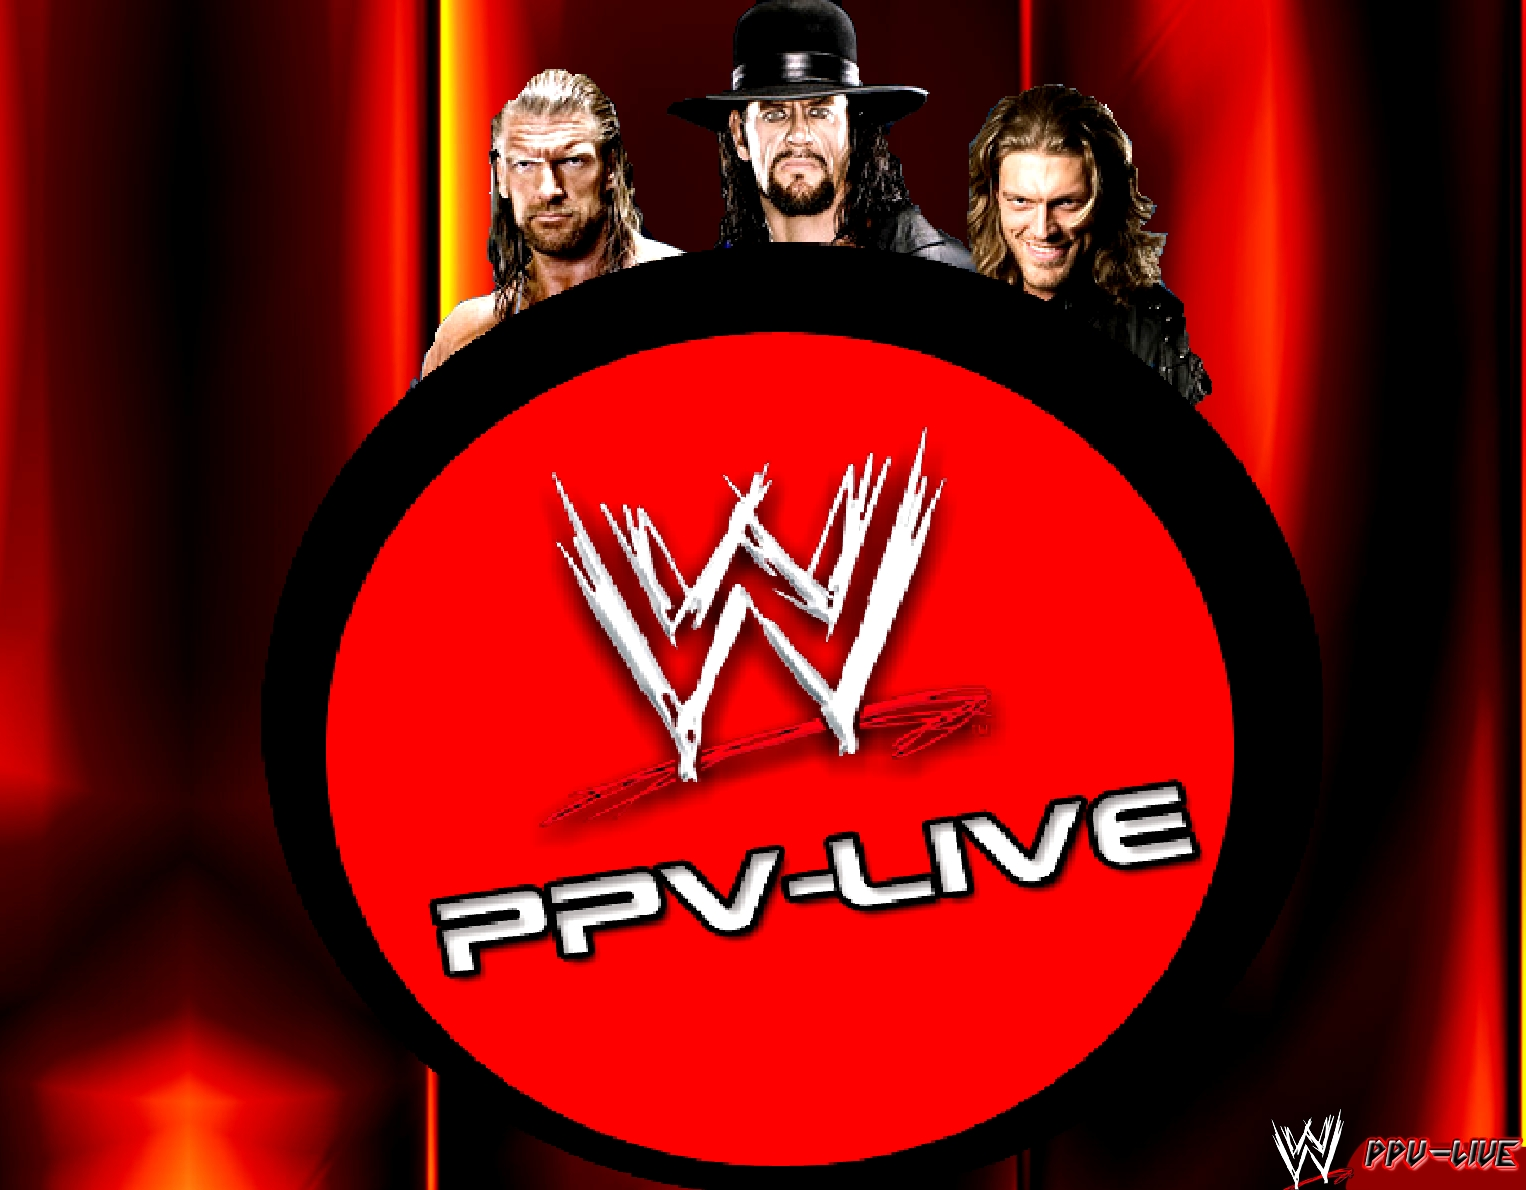 http://4.bp.blogspot.com/-2N8xXlQg1Fk/TYqNRqPBAYI/AAAAAAAAAQo/1dxV_pCDcno/s1600/WWEPPV.jpg